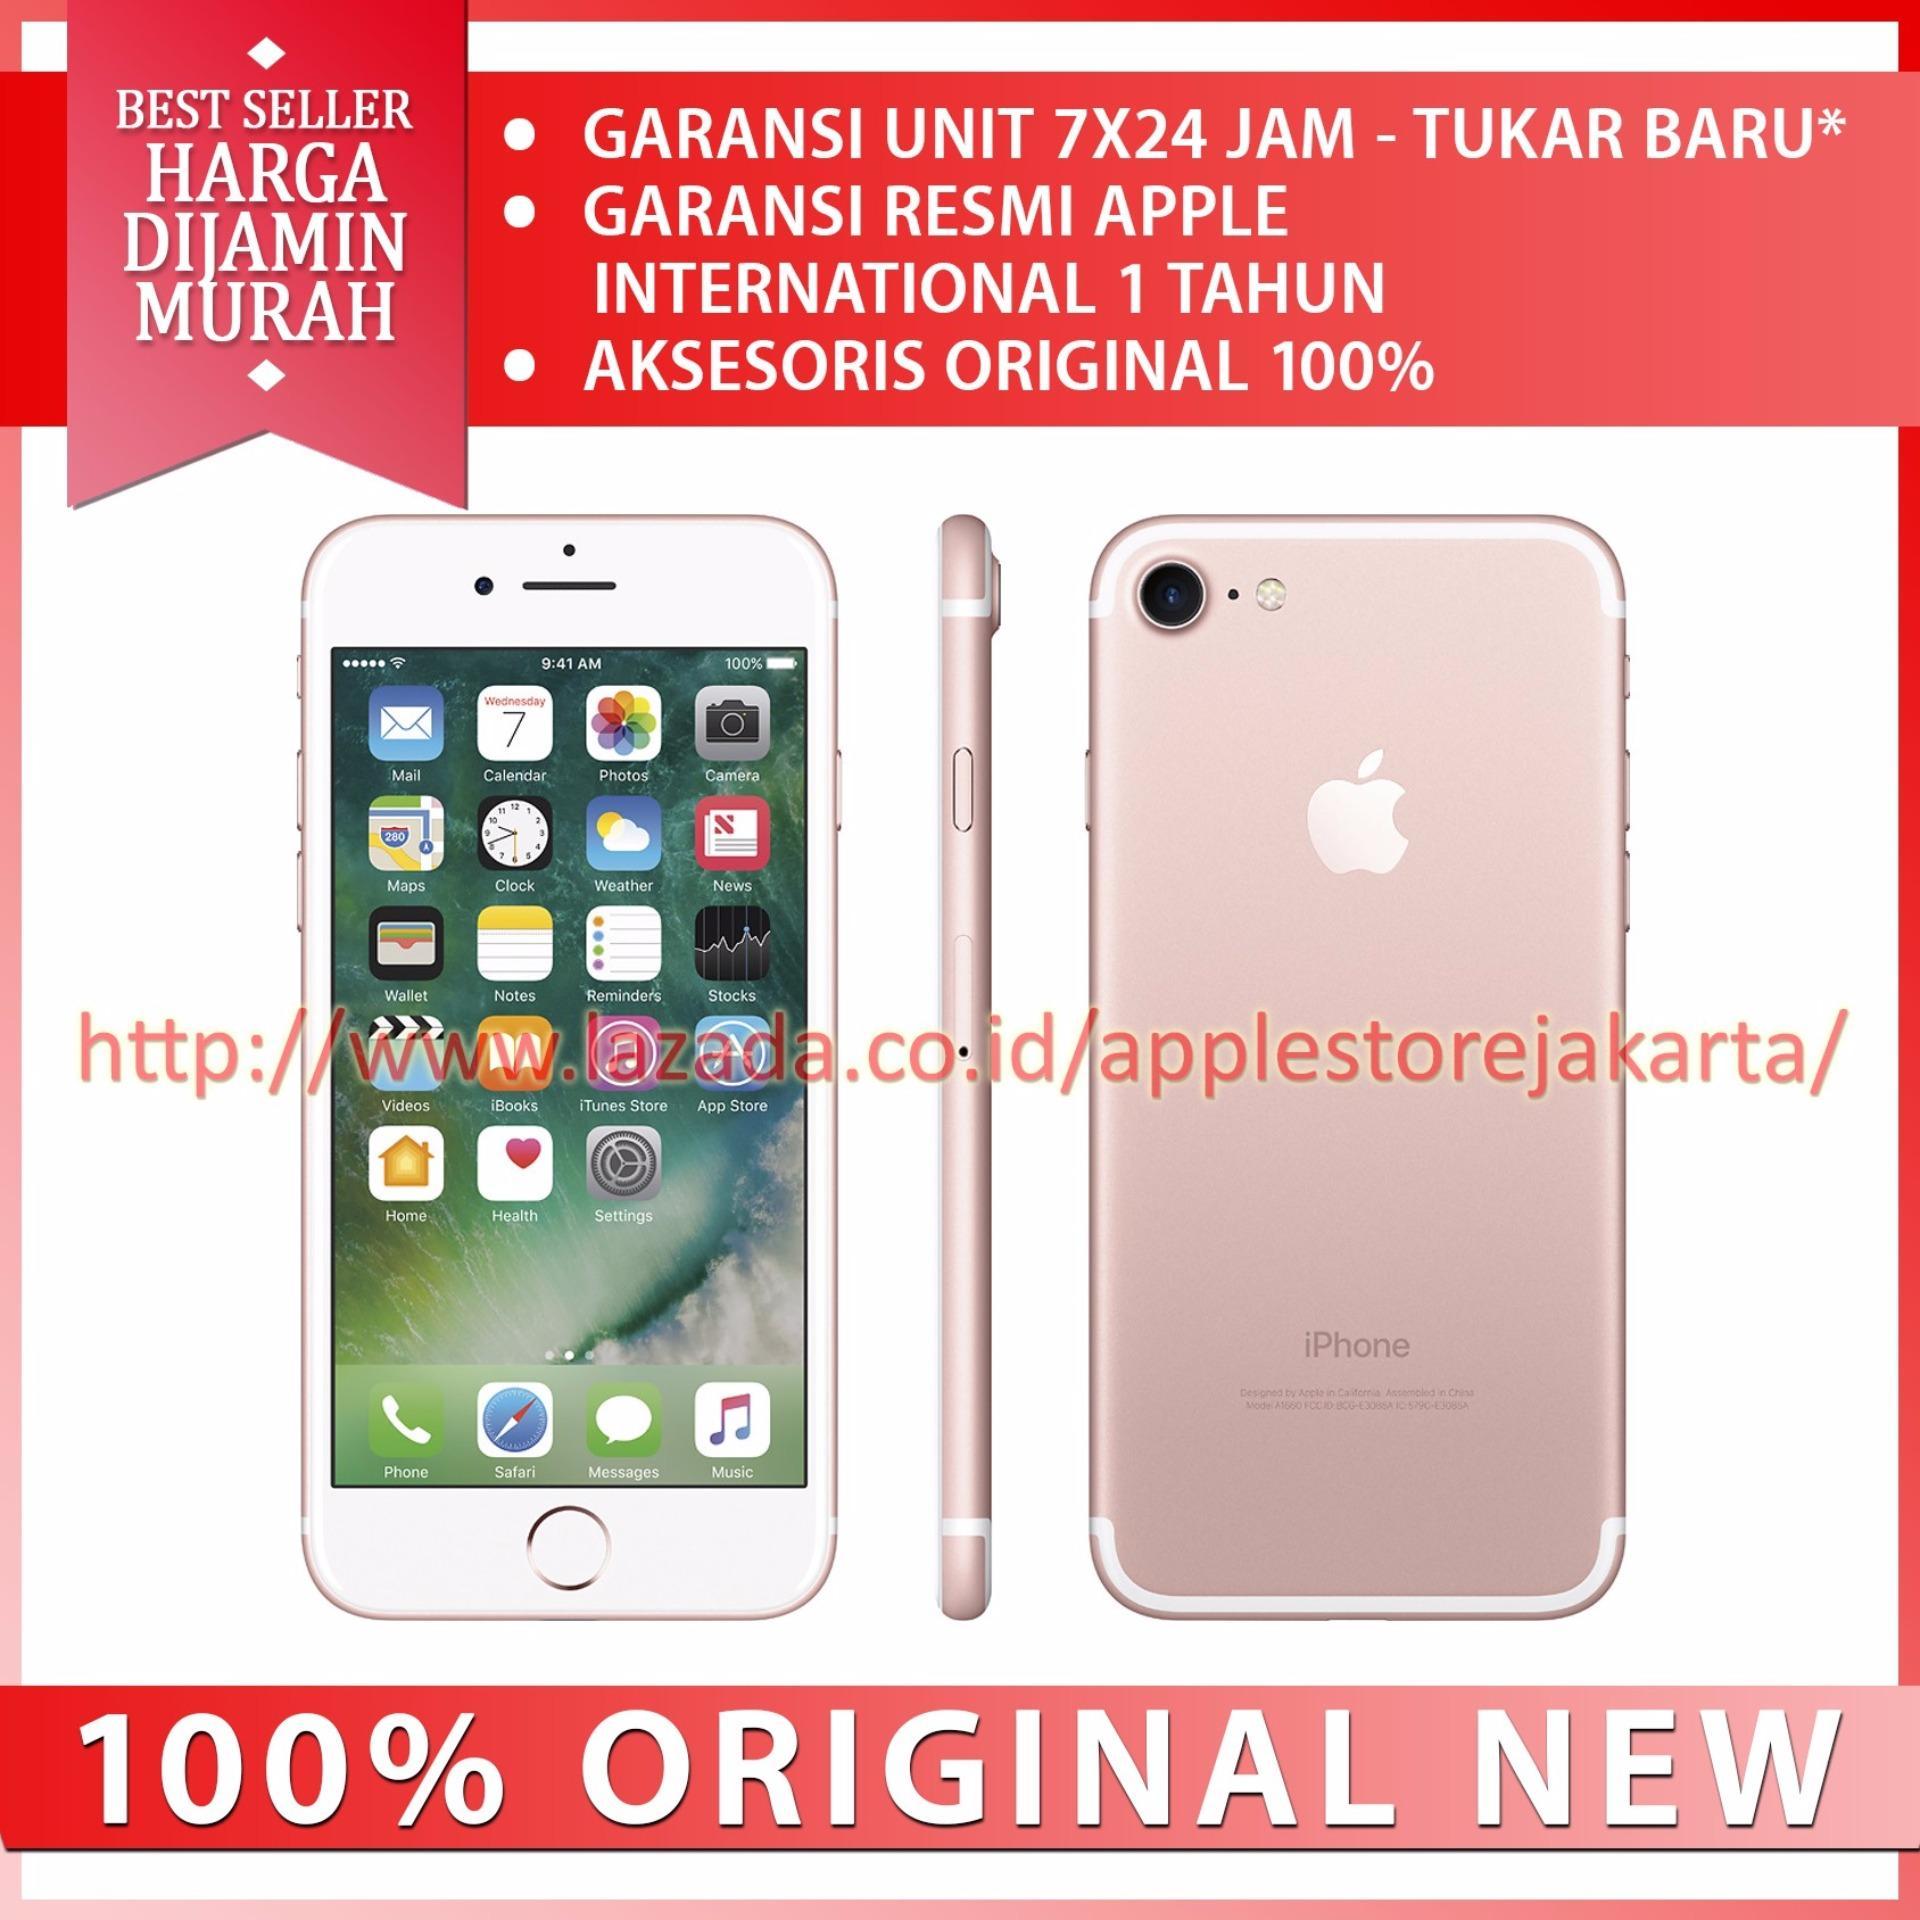 Harga Promo Apple Iphone 6s 32 Gb Smartphone Silver Garansi 7 Resmi 32gb Gold